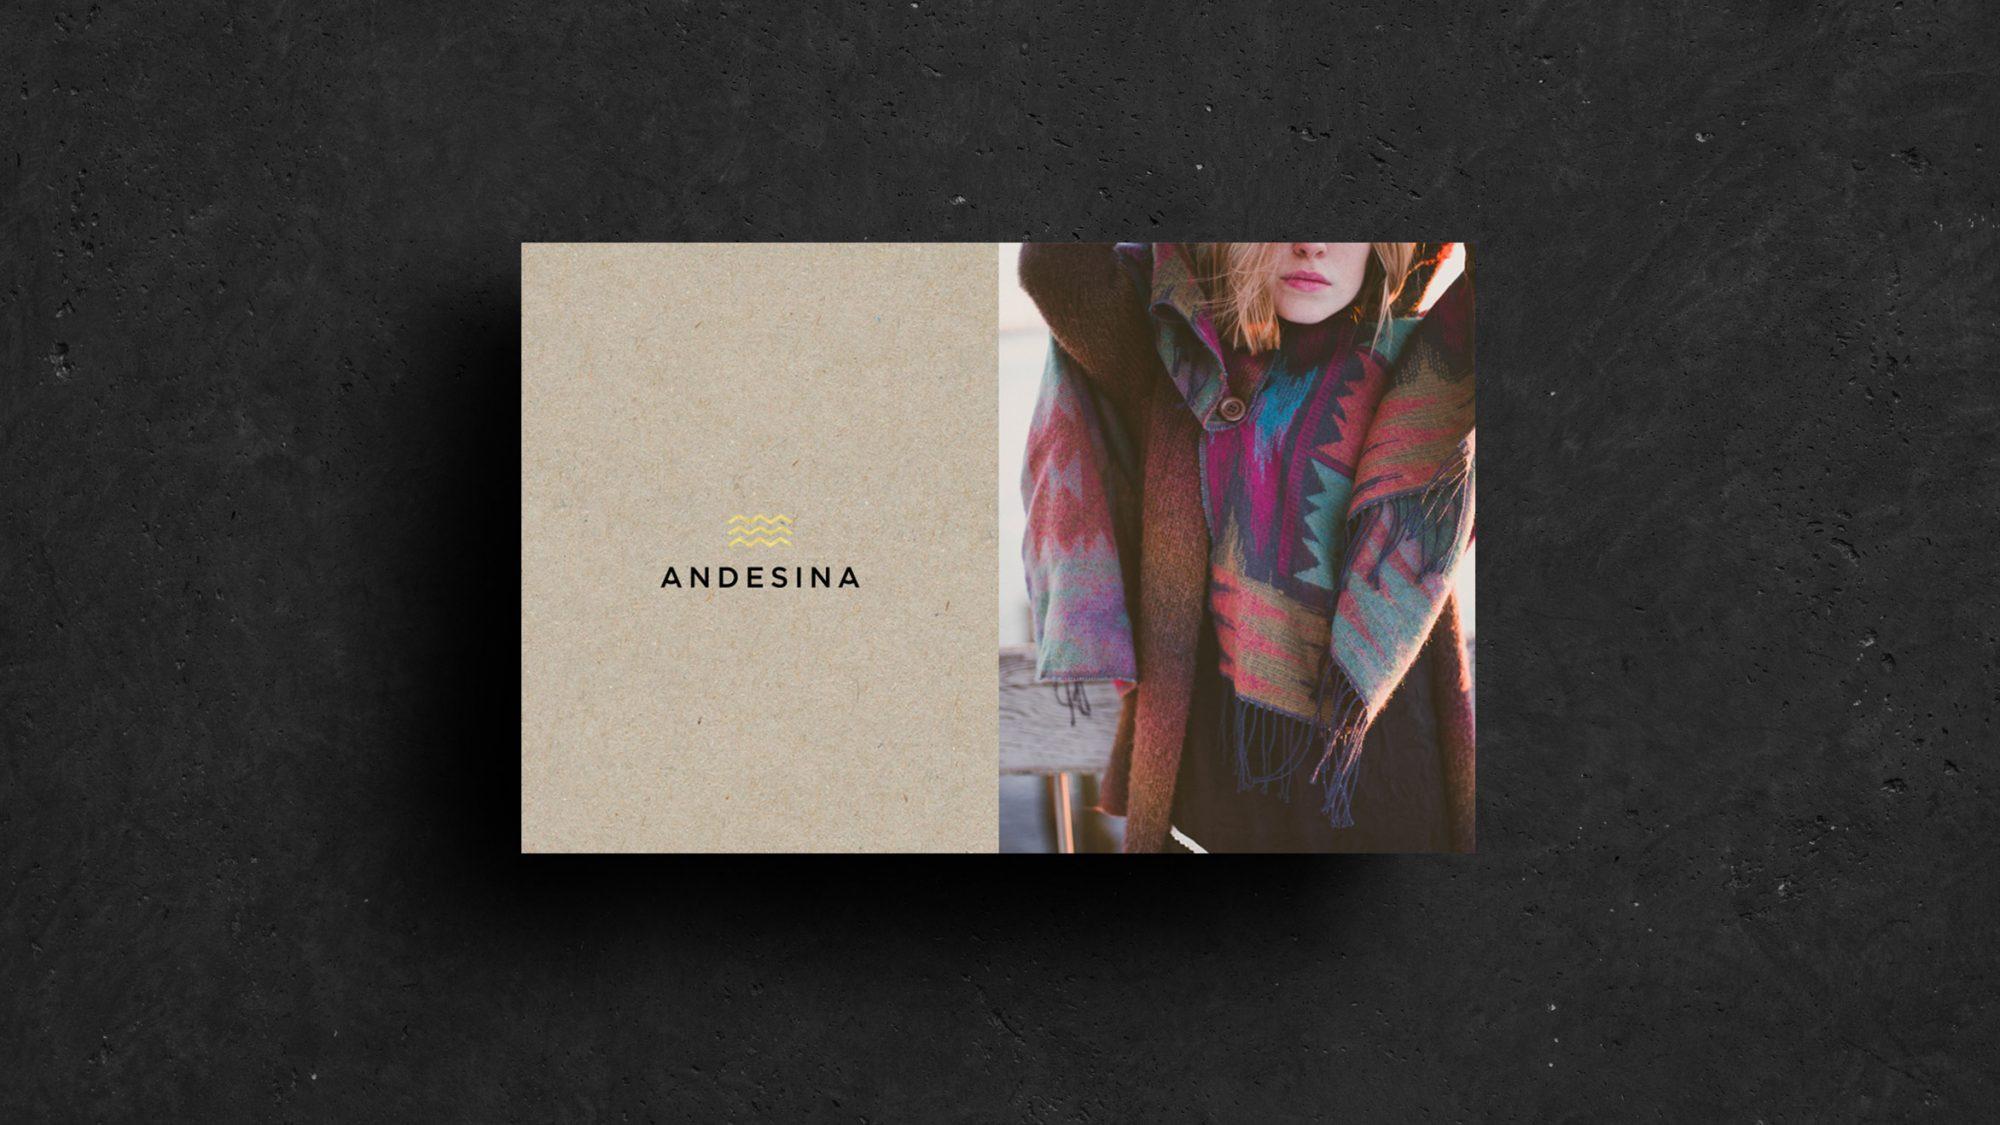 04-sindbad-gillain-andesina-big